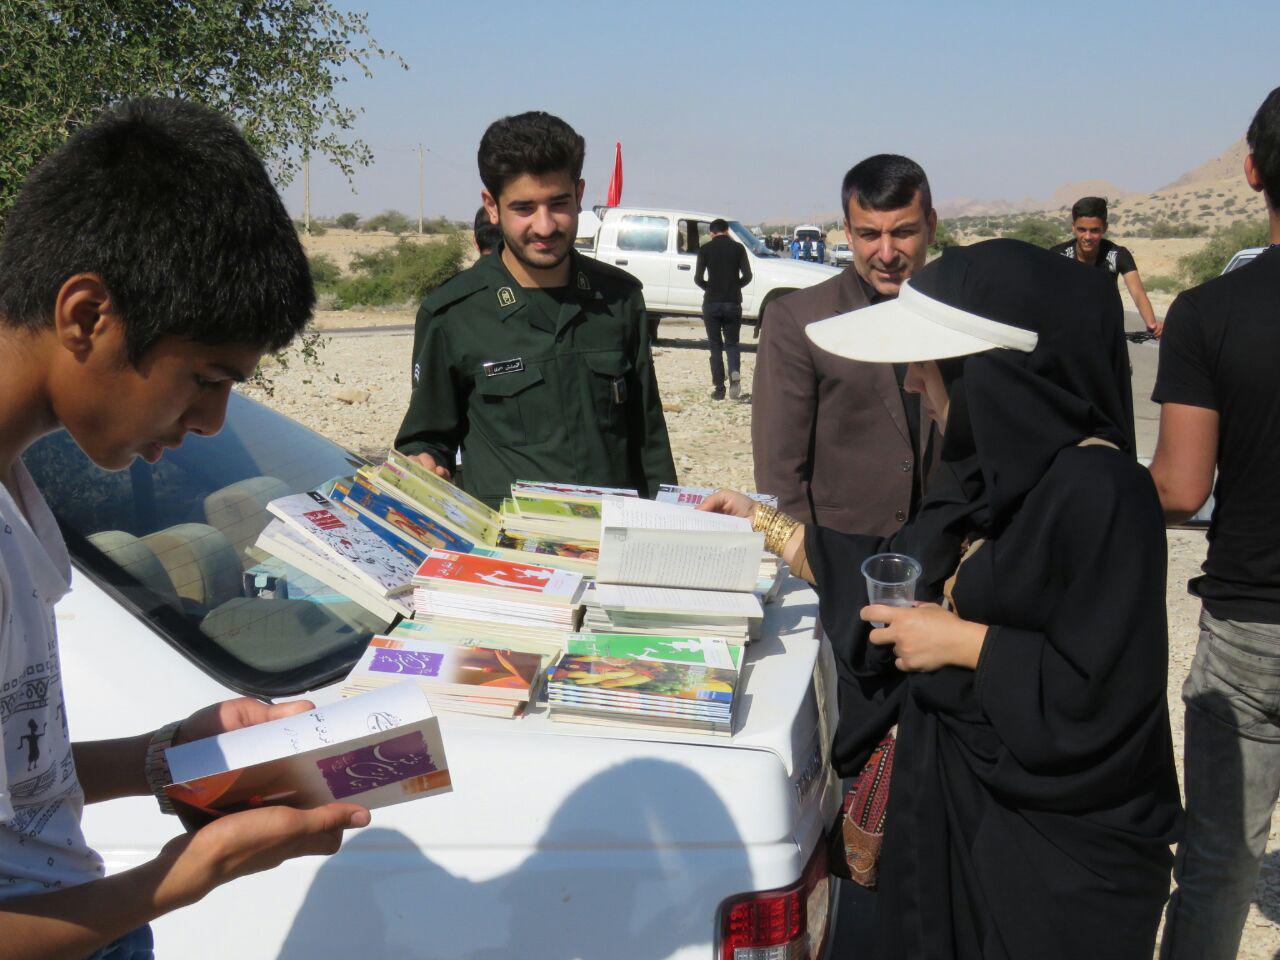 photo_2017-11-09_21-15-19 اهدا کتاب به جاماندگان حرم عشق در فراشبند